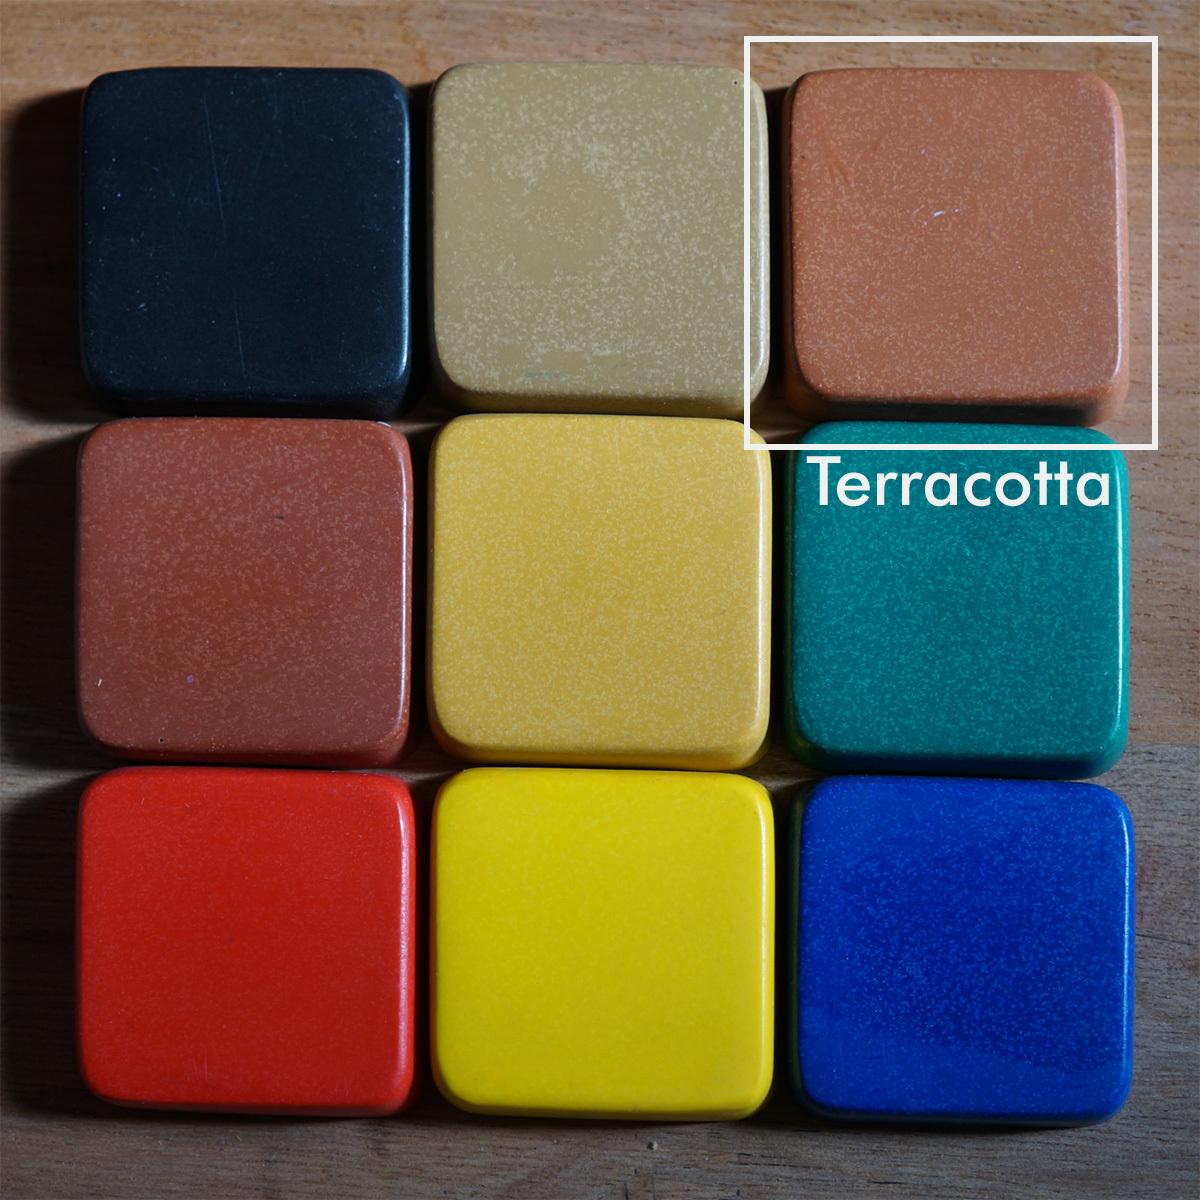 PIGMENT TERRACOTTA 1kg(着色剤:テラコッタ 1kg) - 画像2